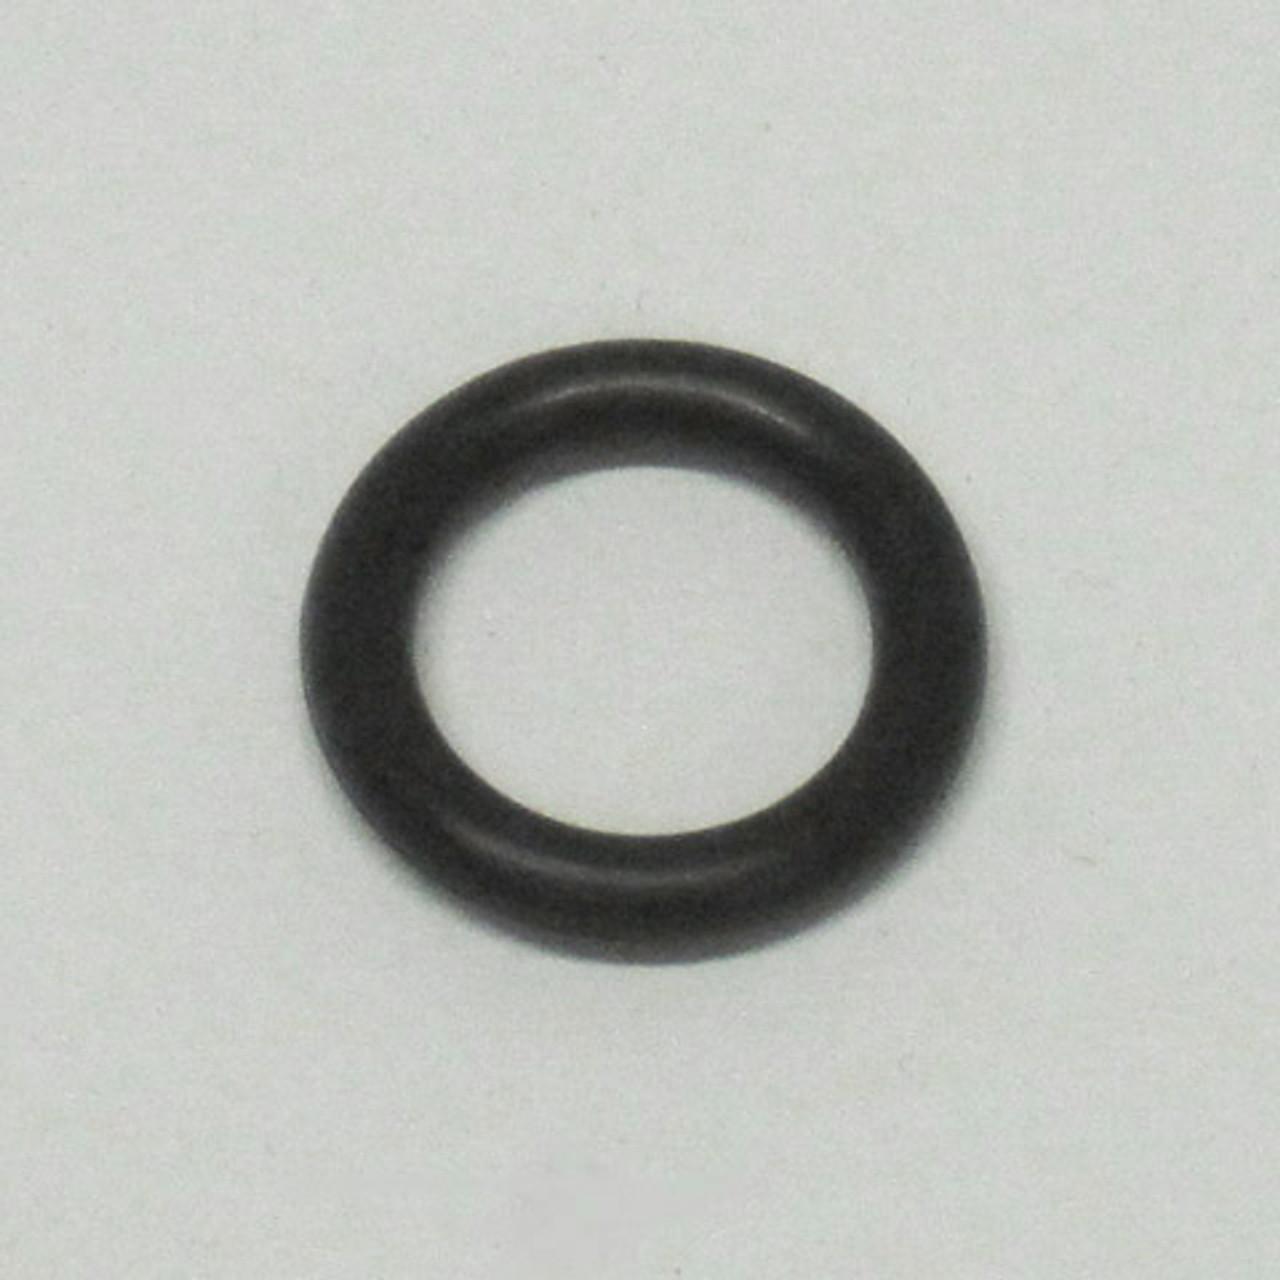 Ball Lock Keg Post O-Ring